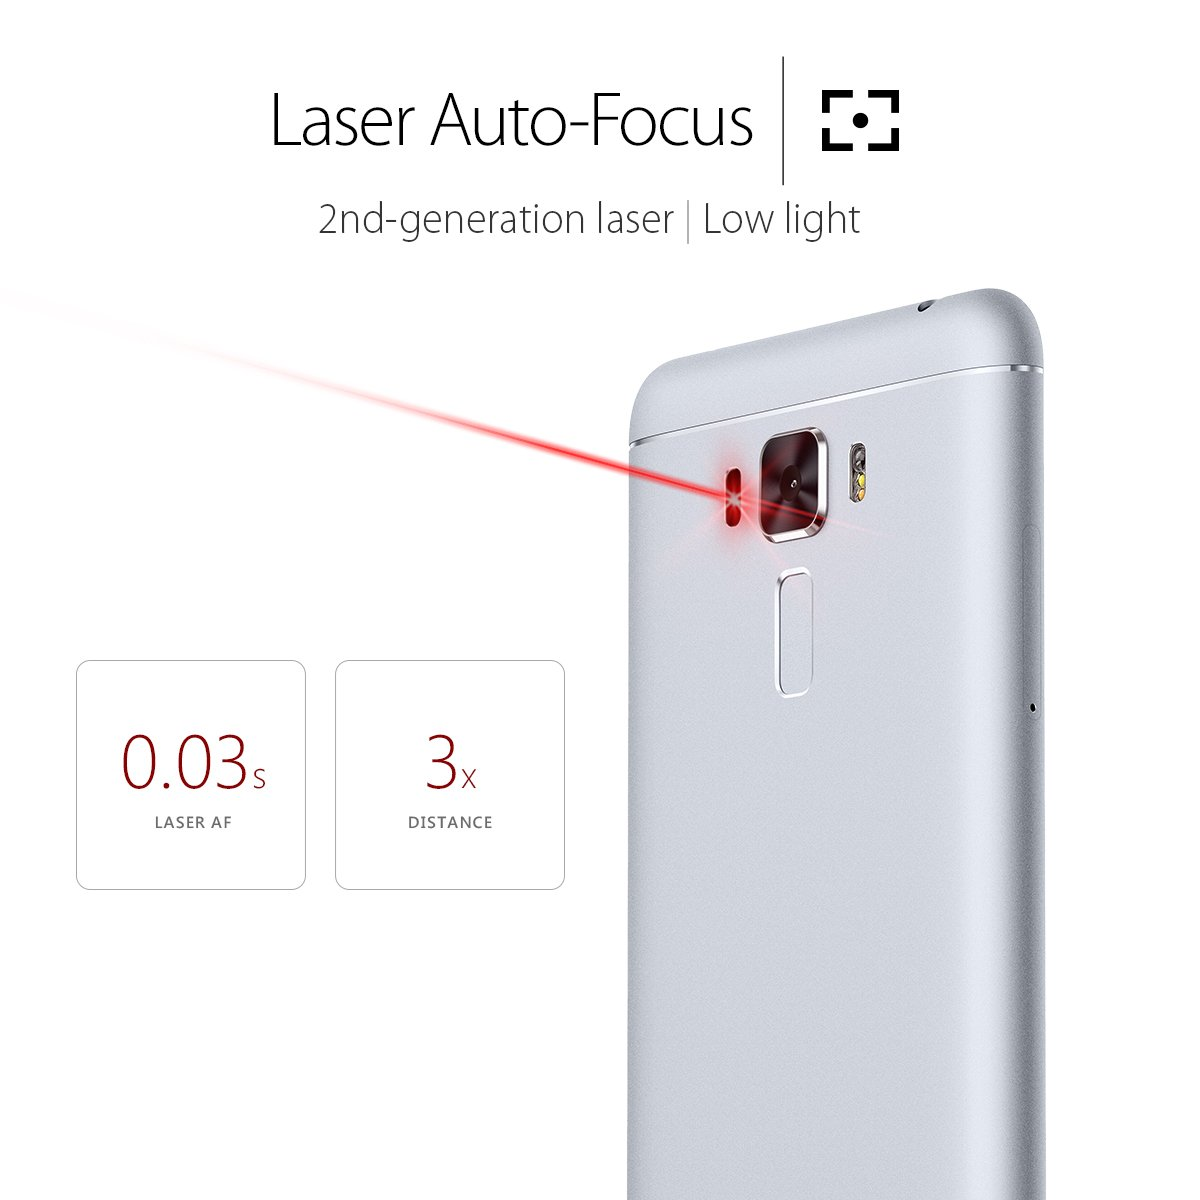 Asus Zenfone 3 Laser 55 Inch Glacier Silver Zc551kl Zoom S Ze553kl Lte 55ampquot 4 64gb Auto Focus 13mp Rear 8mp Front Camera Ips Fhd Display 2gb Ram 32gb Storage